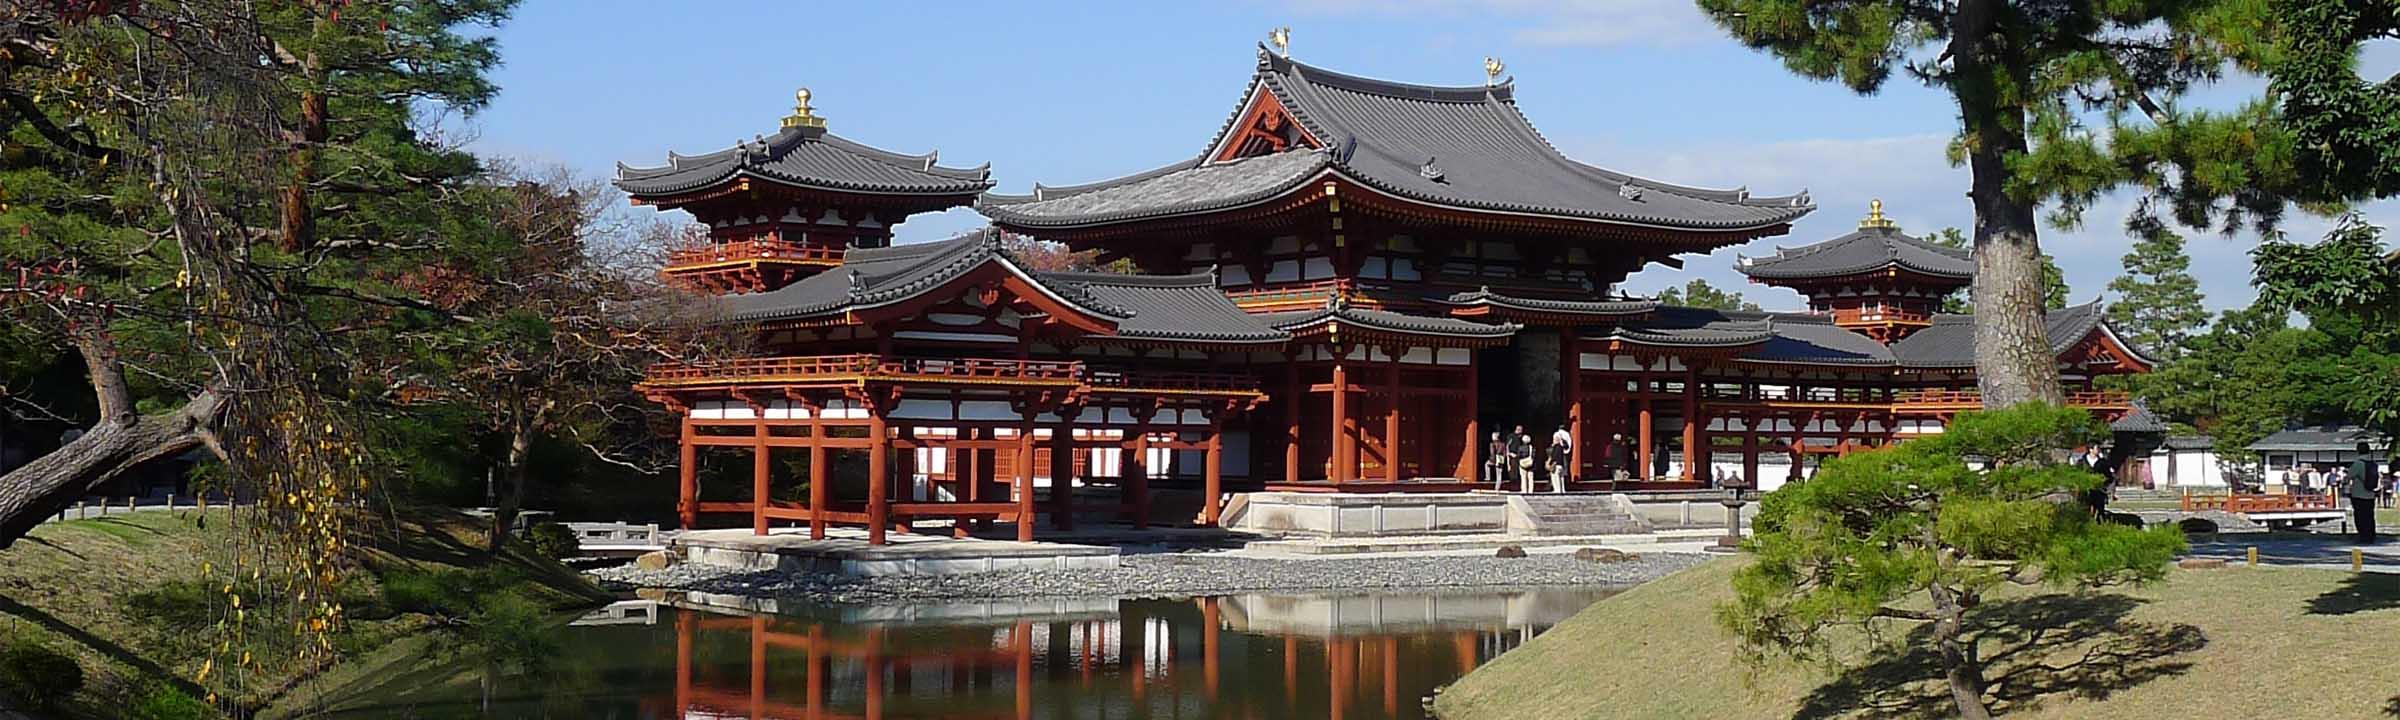 Traditional Kyoto